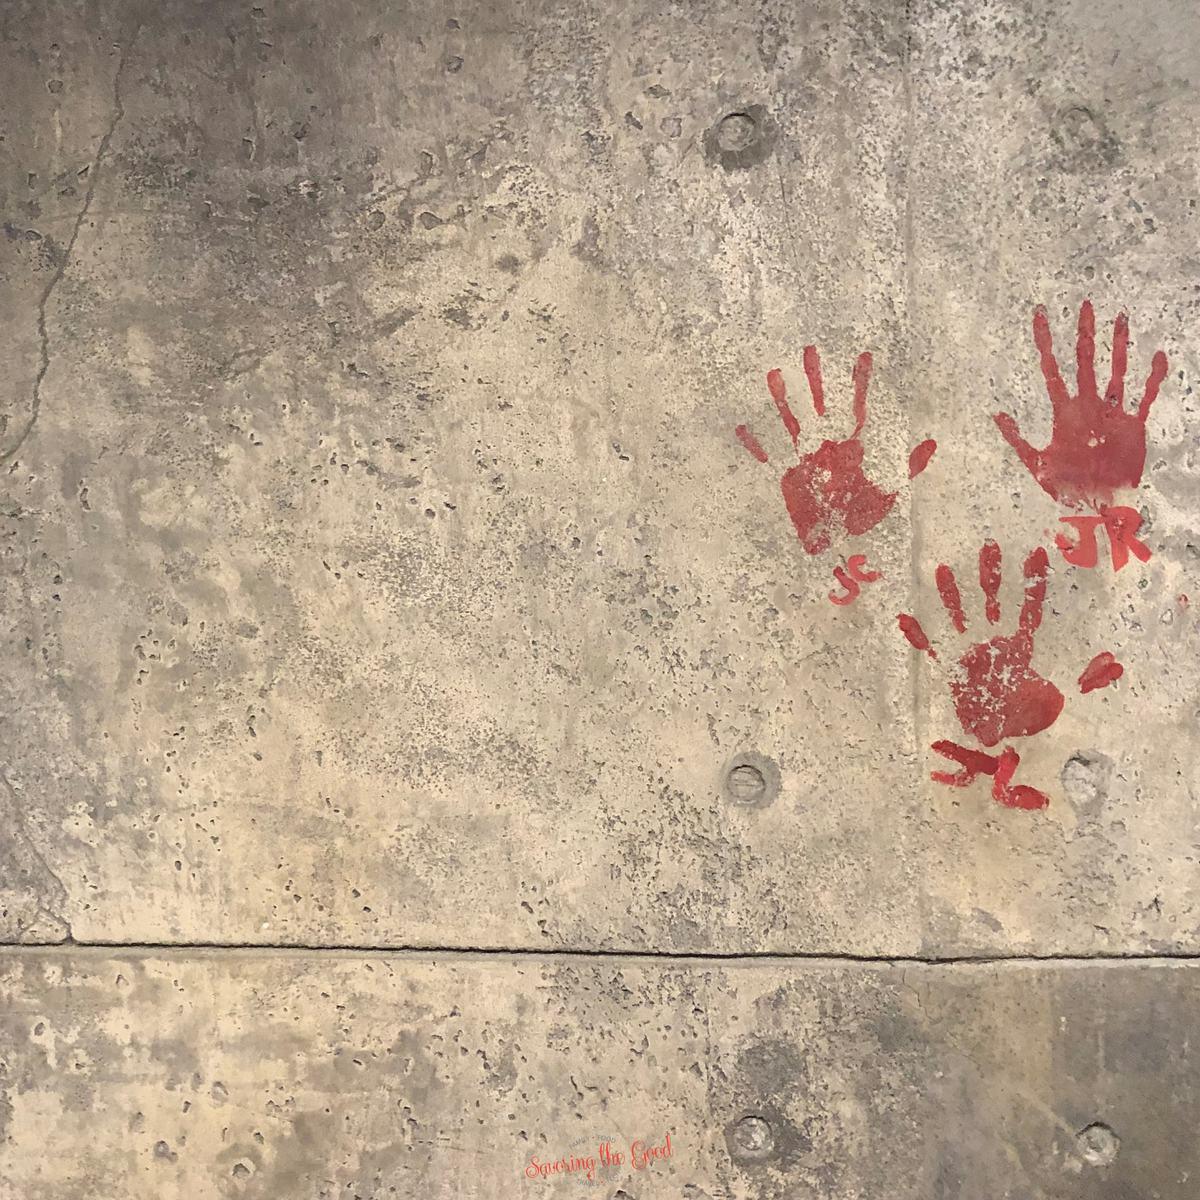 Red handprints and initials of James Cameron, Jon Landau, and Joe Rohde wallpaper for Pandora, Flight Of Passage for Microsoft Teams